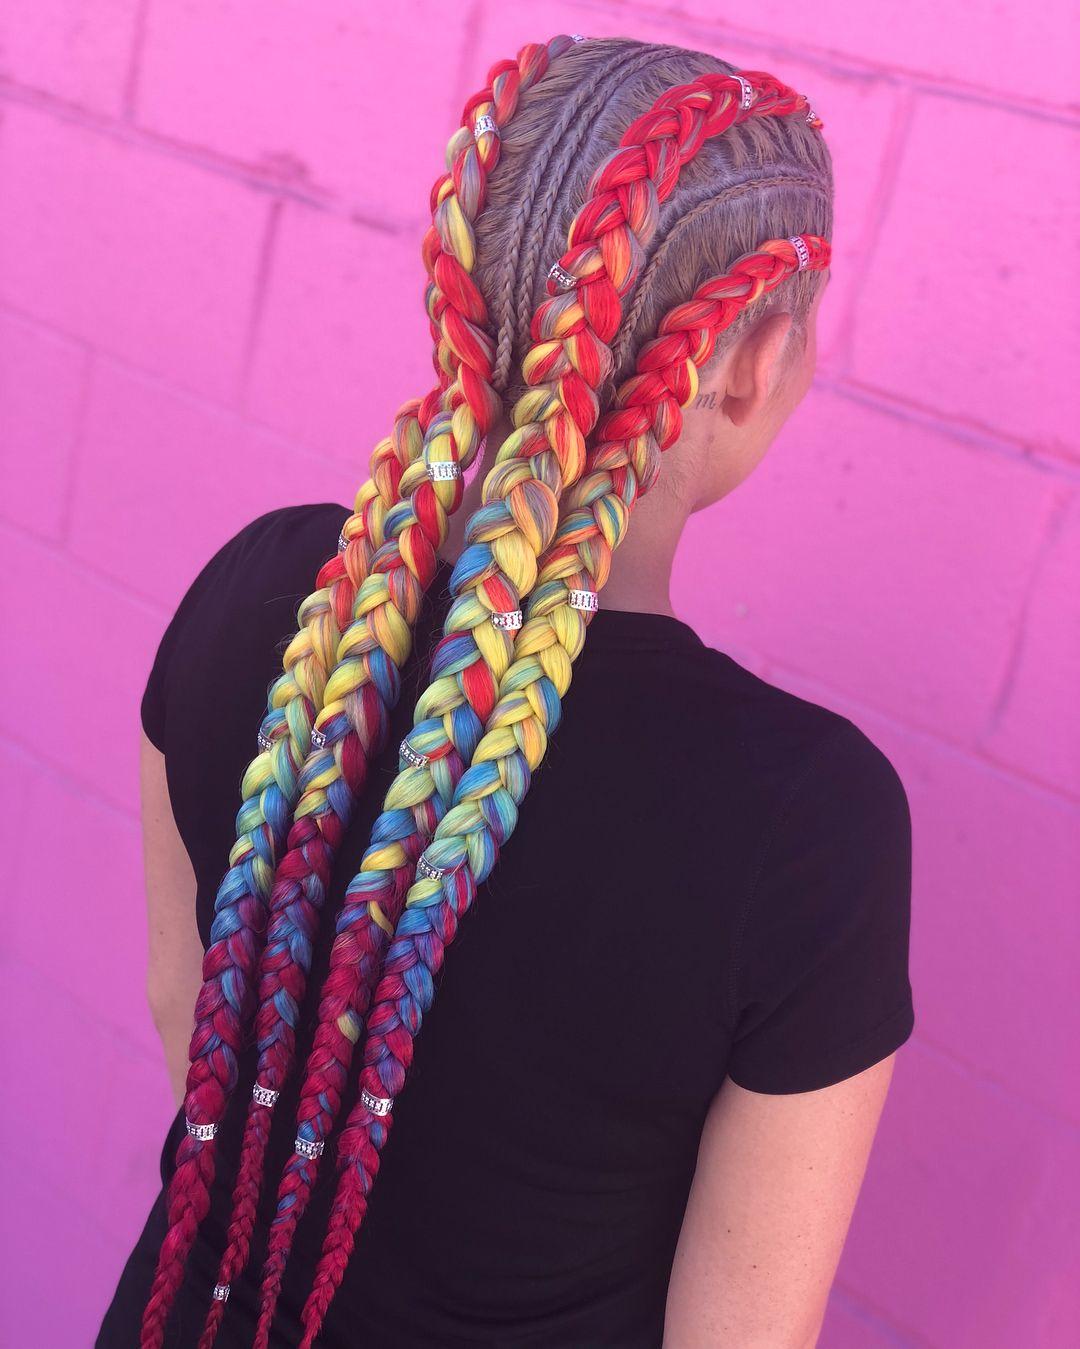 Pin By Joy Martin On Hair Festival Braid Hair Styles Festival